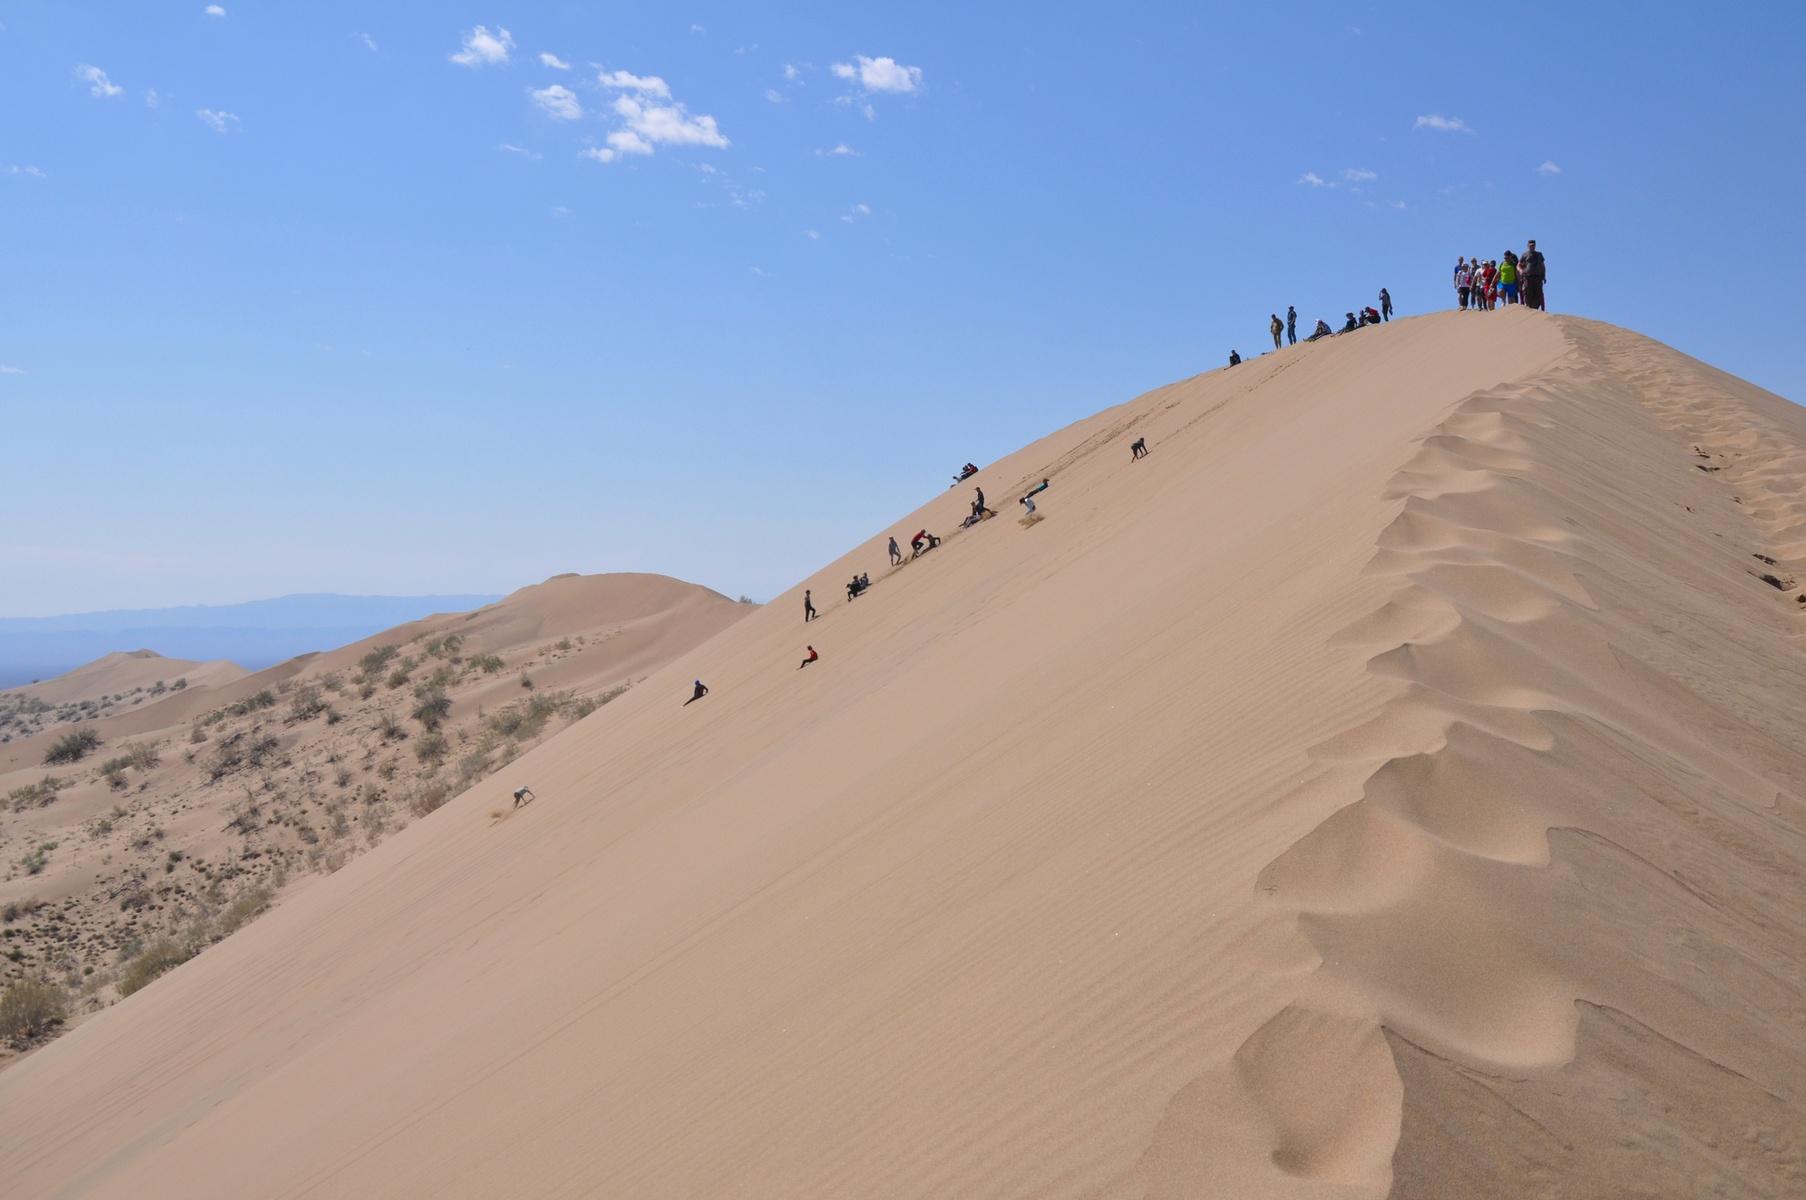 steep sand dune pursued - HD1806×1200